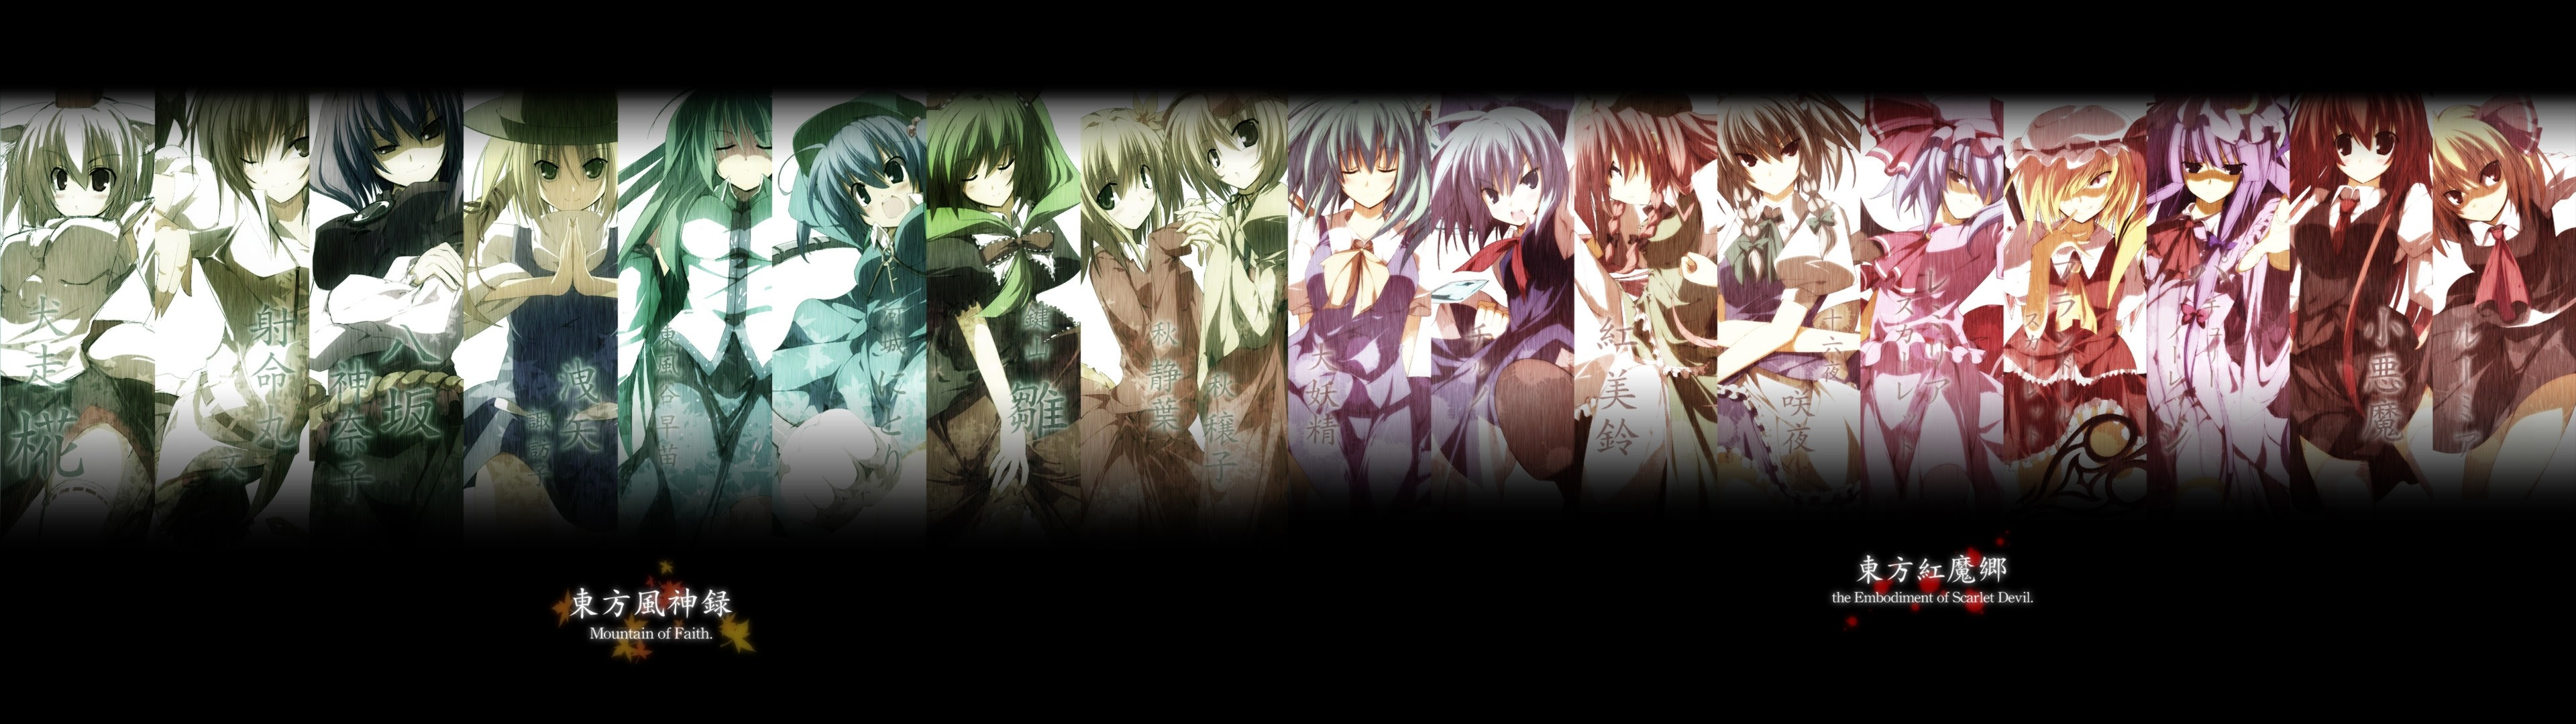 17 Dual Screen Wallpaper 4k Anime Sachi Wallpaper